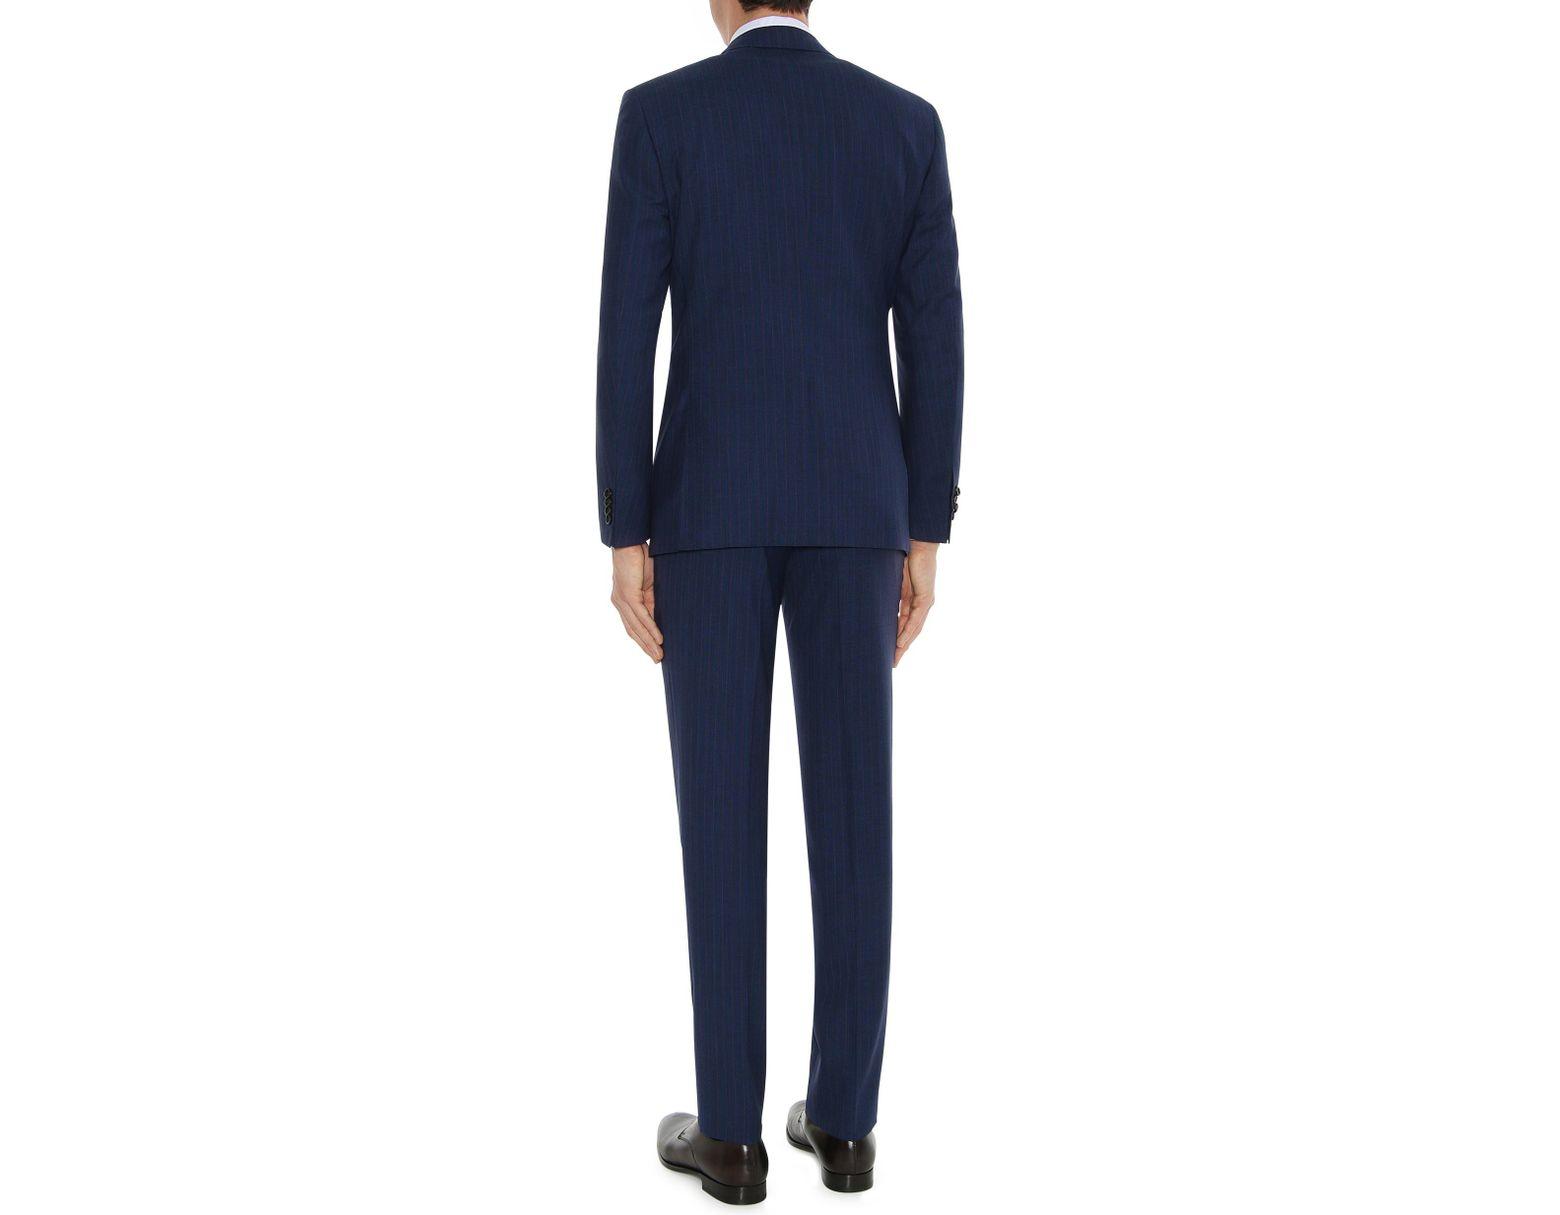 7ffa6399 Men's Navy Blue Impeccabile Wool Pinstripe Milano Suit